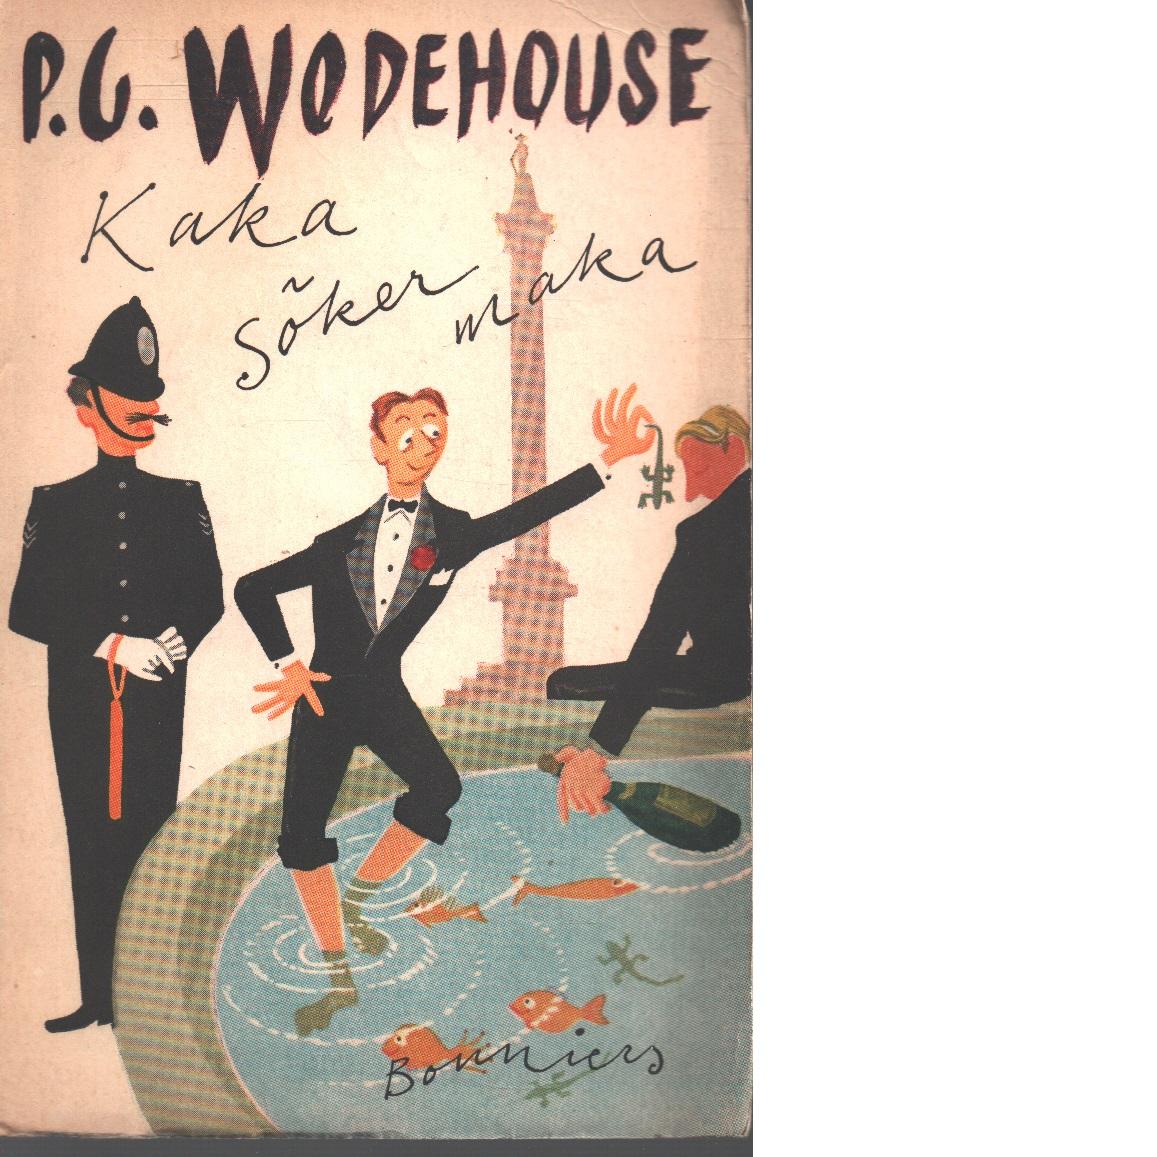 Kaka söker maka - Wodehouse, P. G.